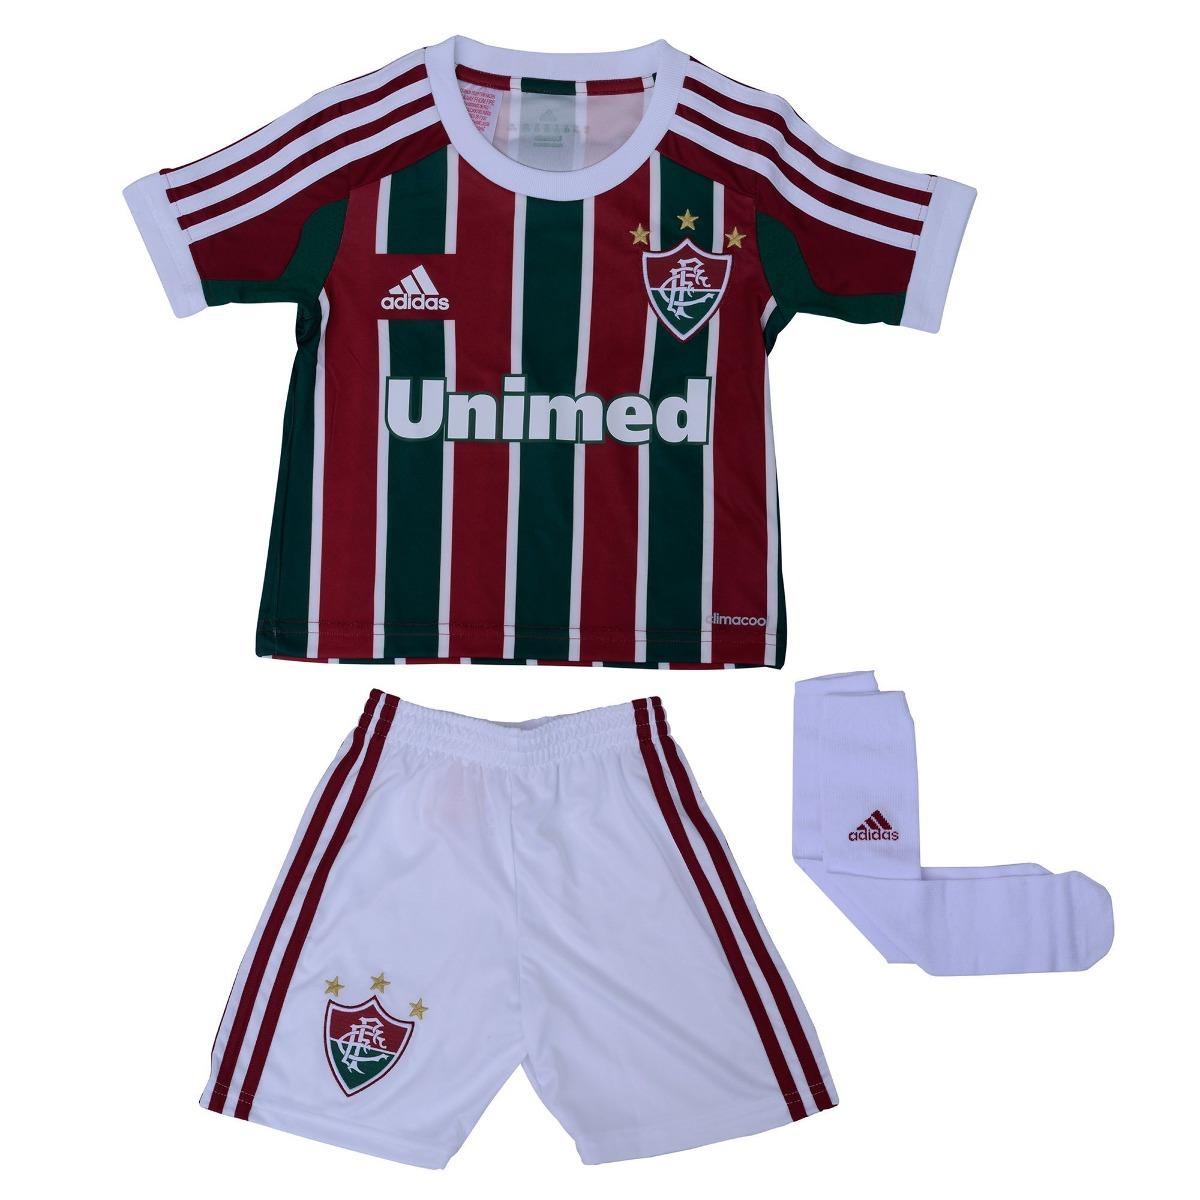 d8ccf7e4462e9 2anos Mini Kit adidas Fluminense Camisa Shorts Meião 1magnus - R  69 ...